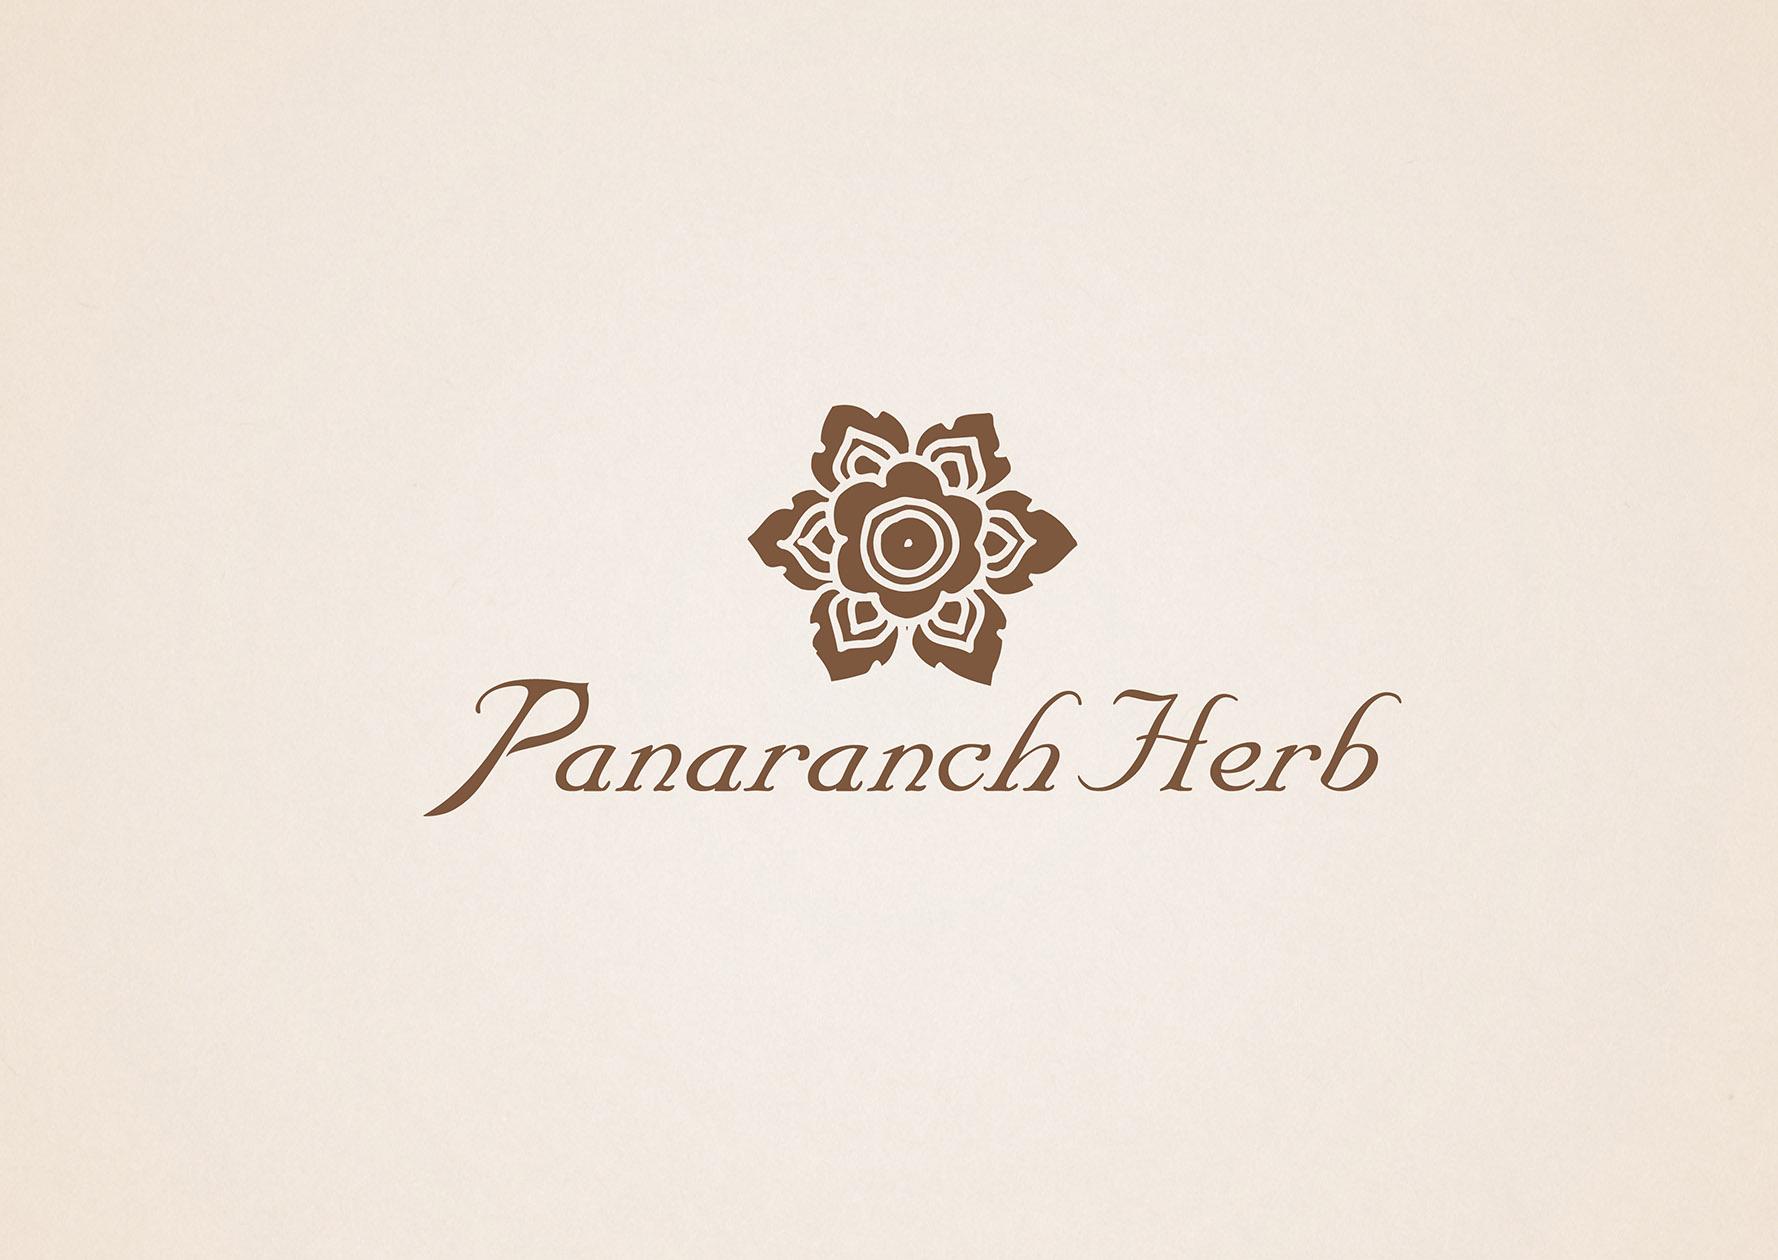 Panaranch logo design